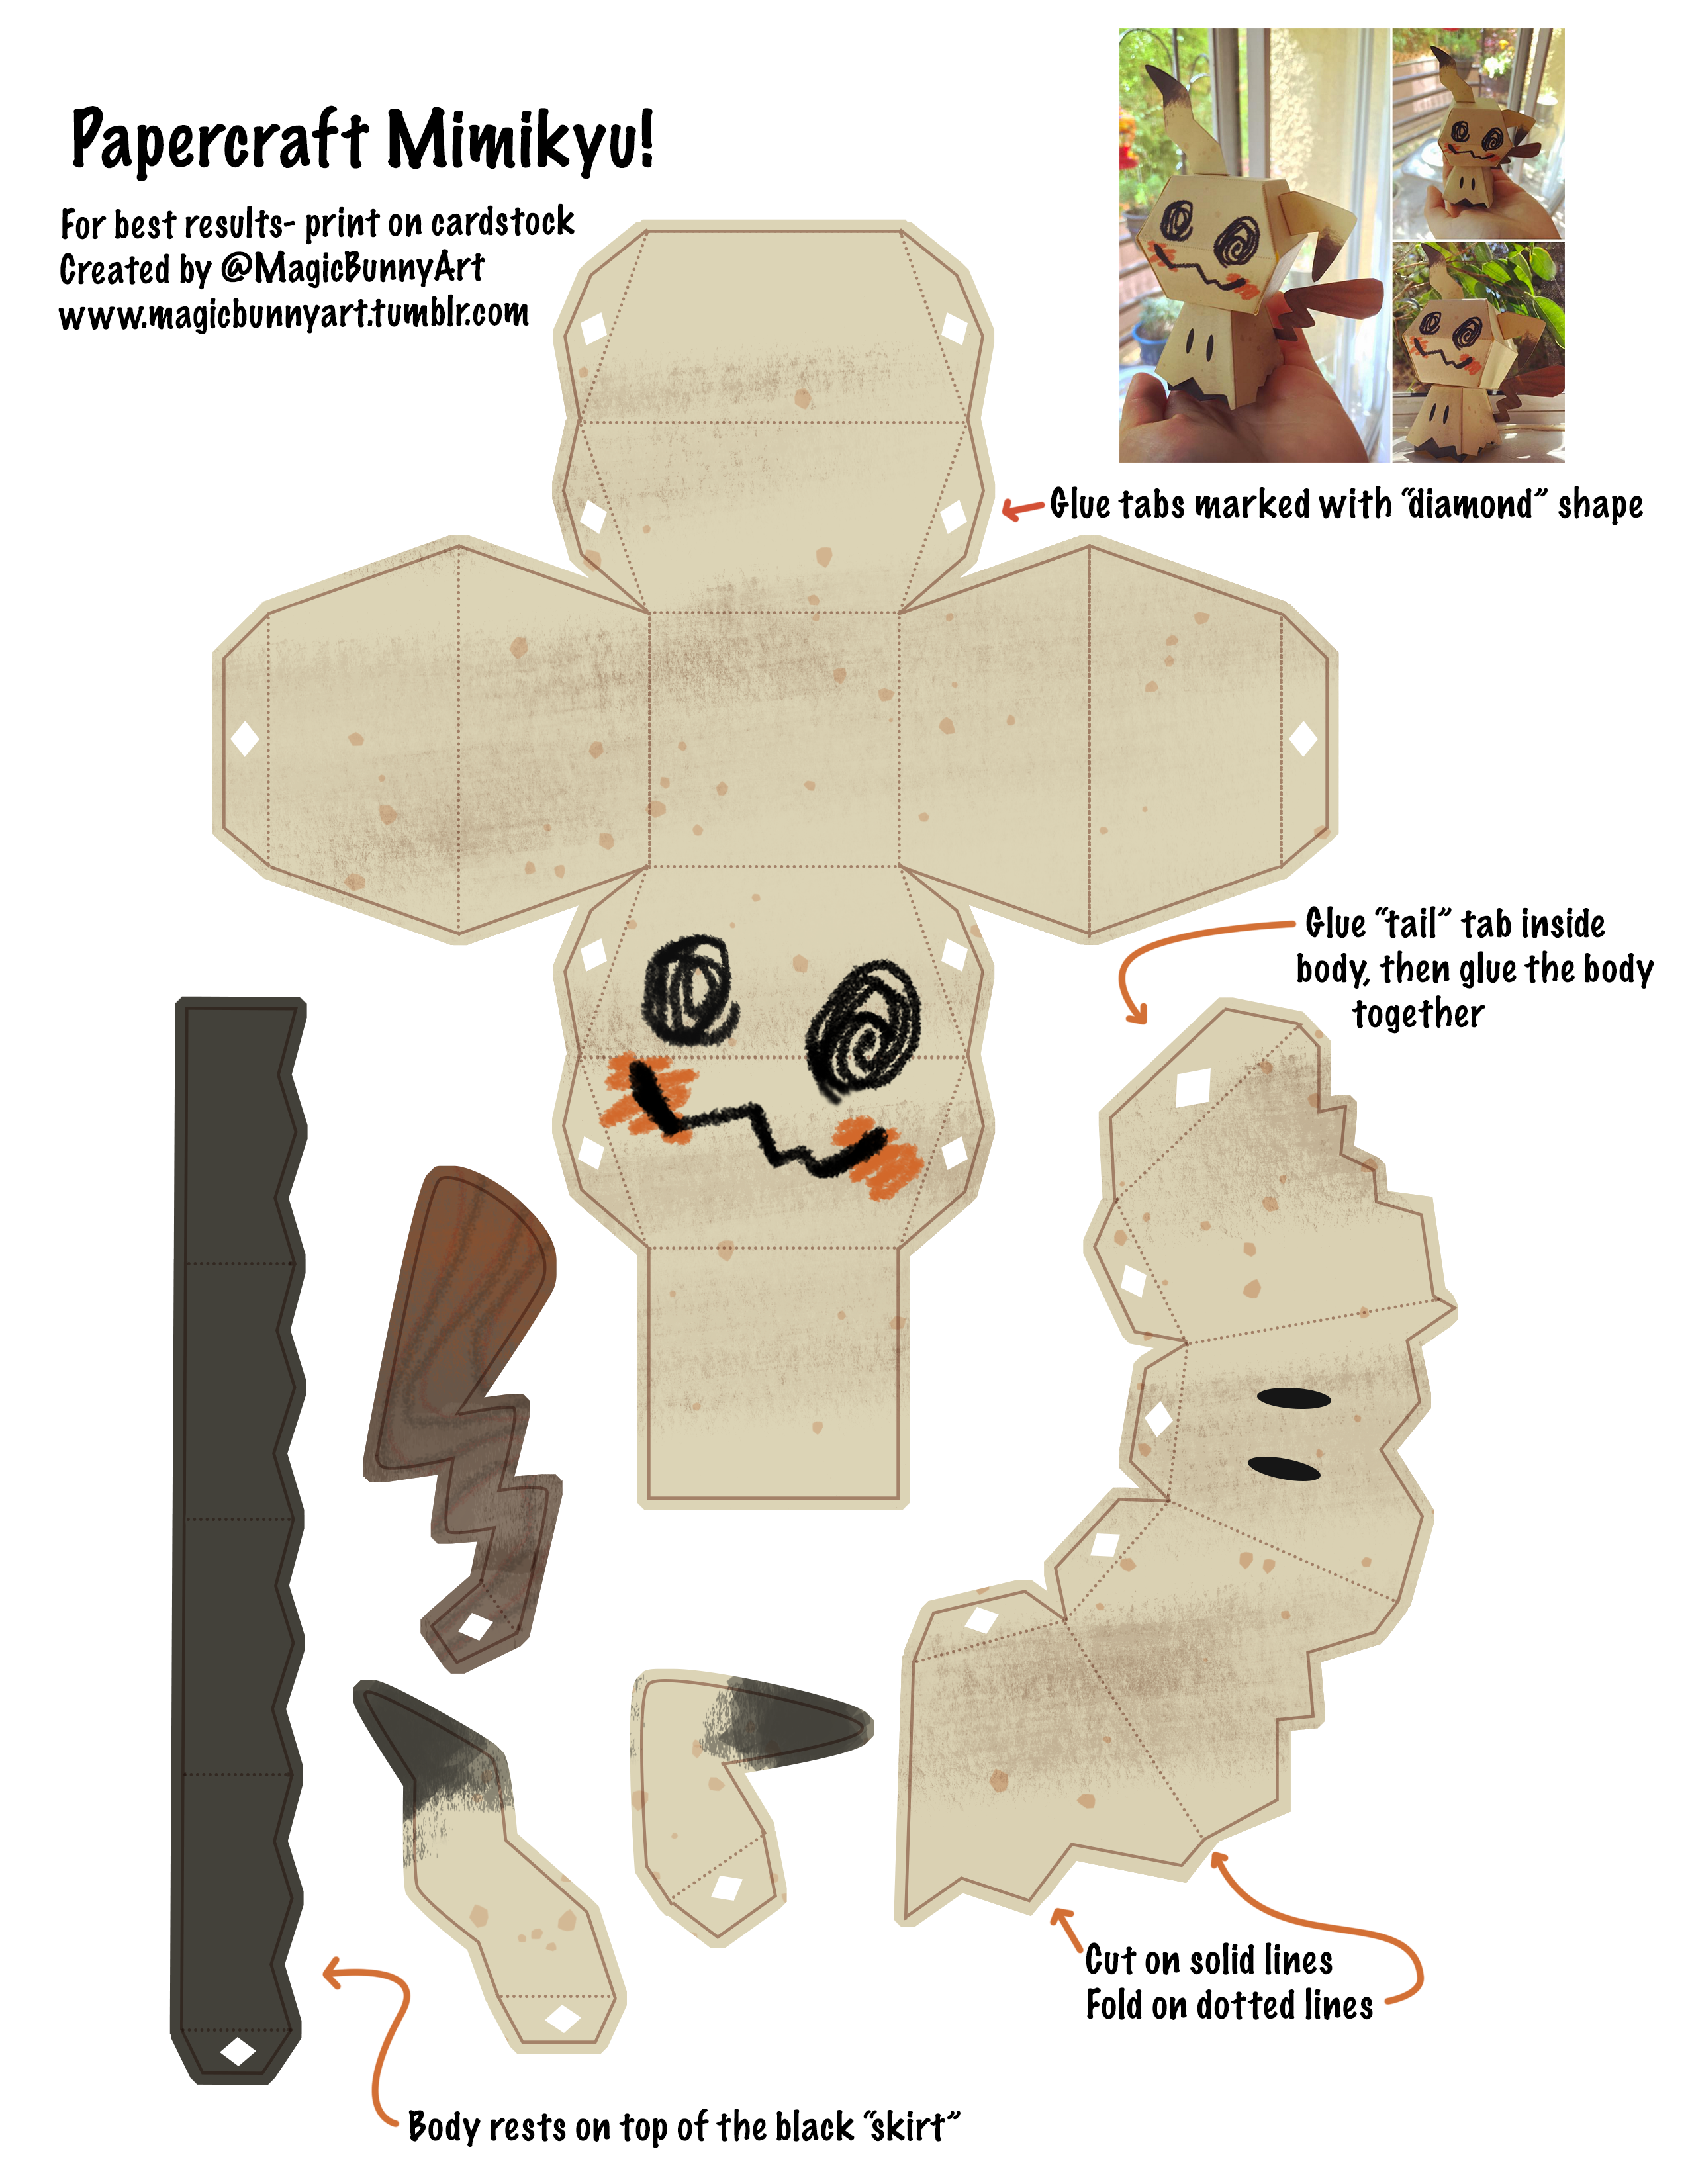 mimikyu_papercraft_template_by_magicbunnyart-daew2j4.png (2550×3300 ...